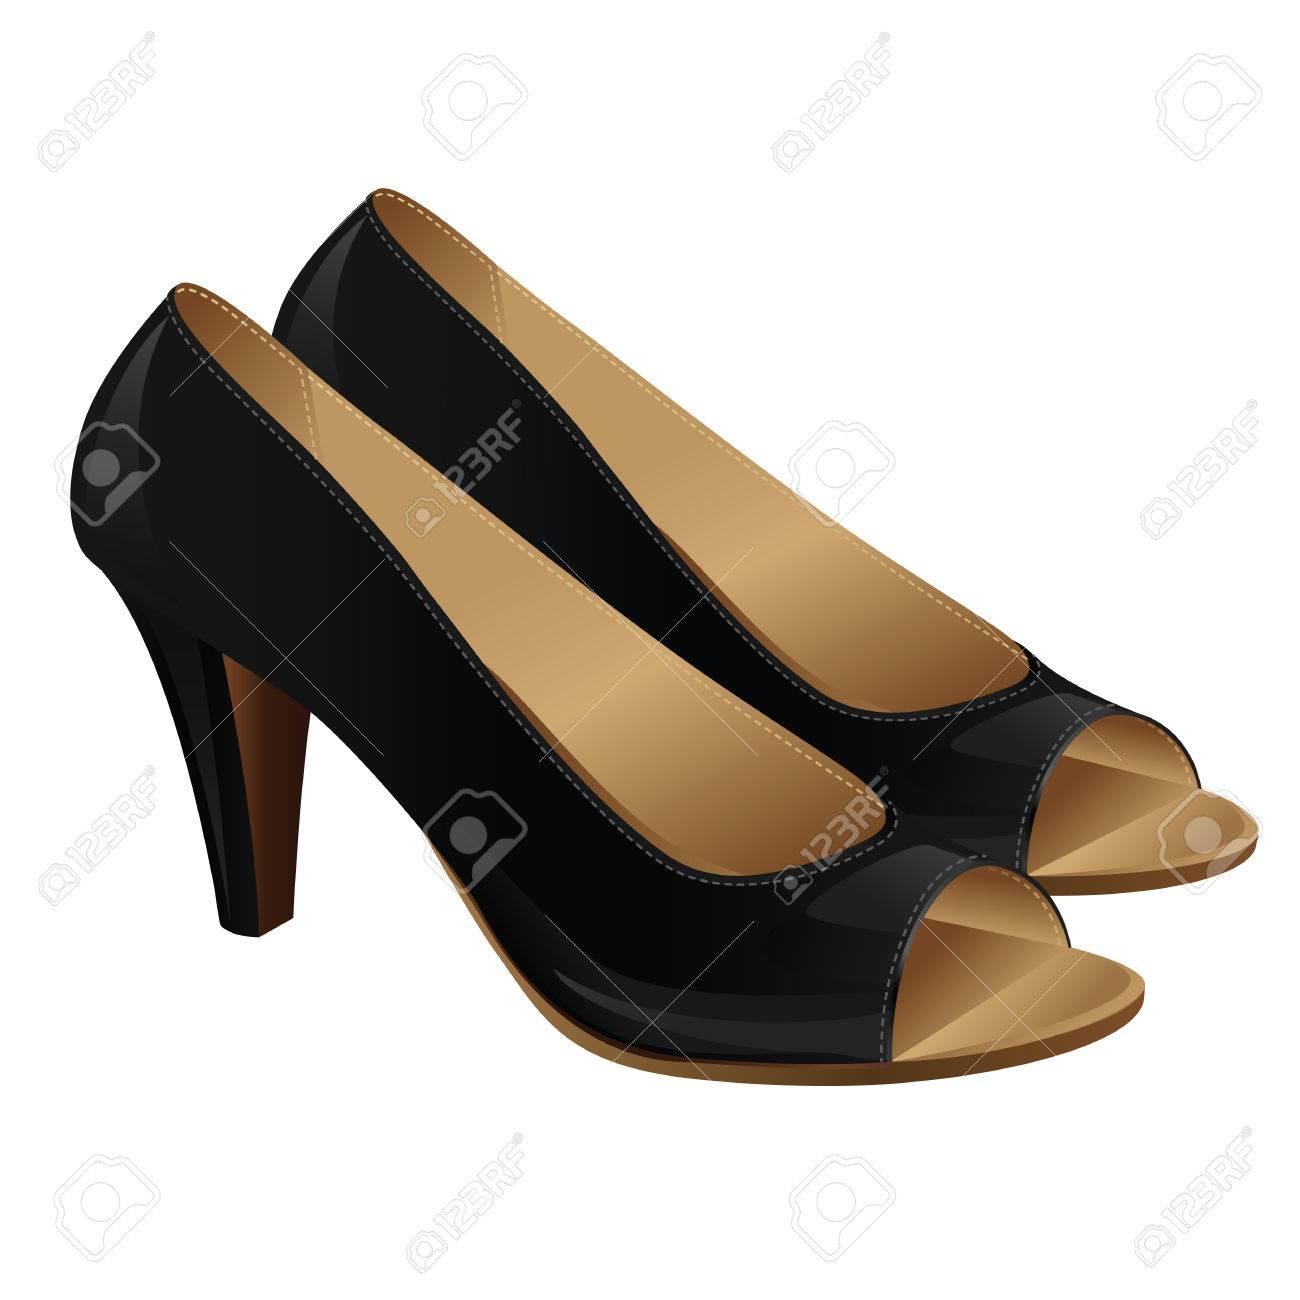 Zapatos rojos formales Art para mujer brWFi81OL